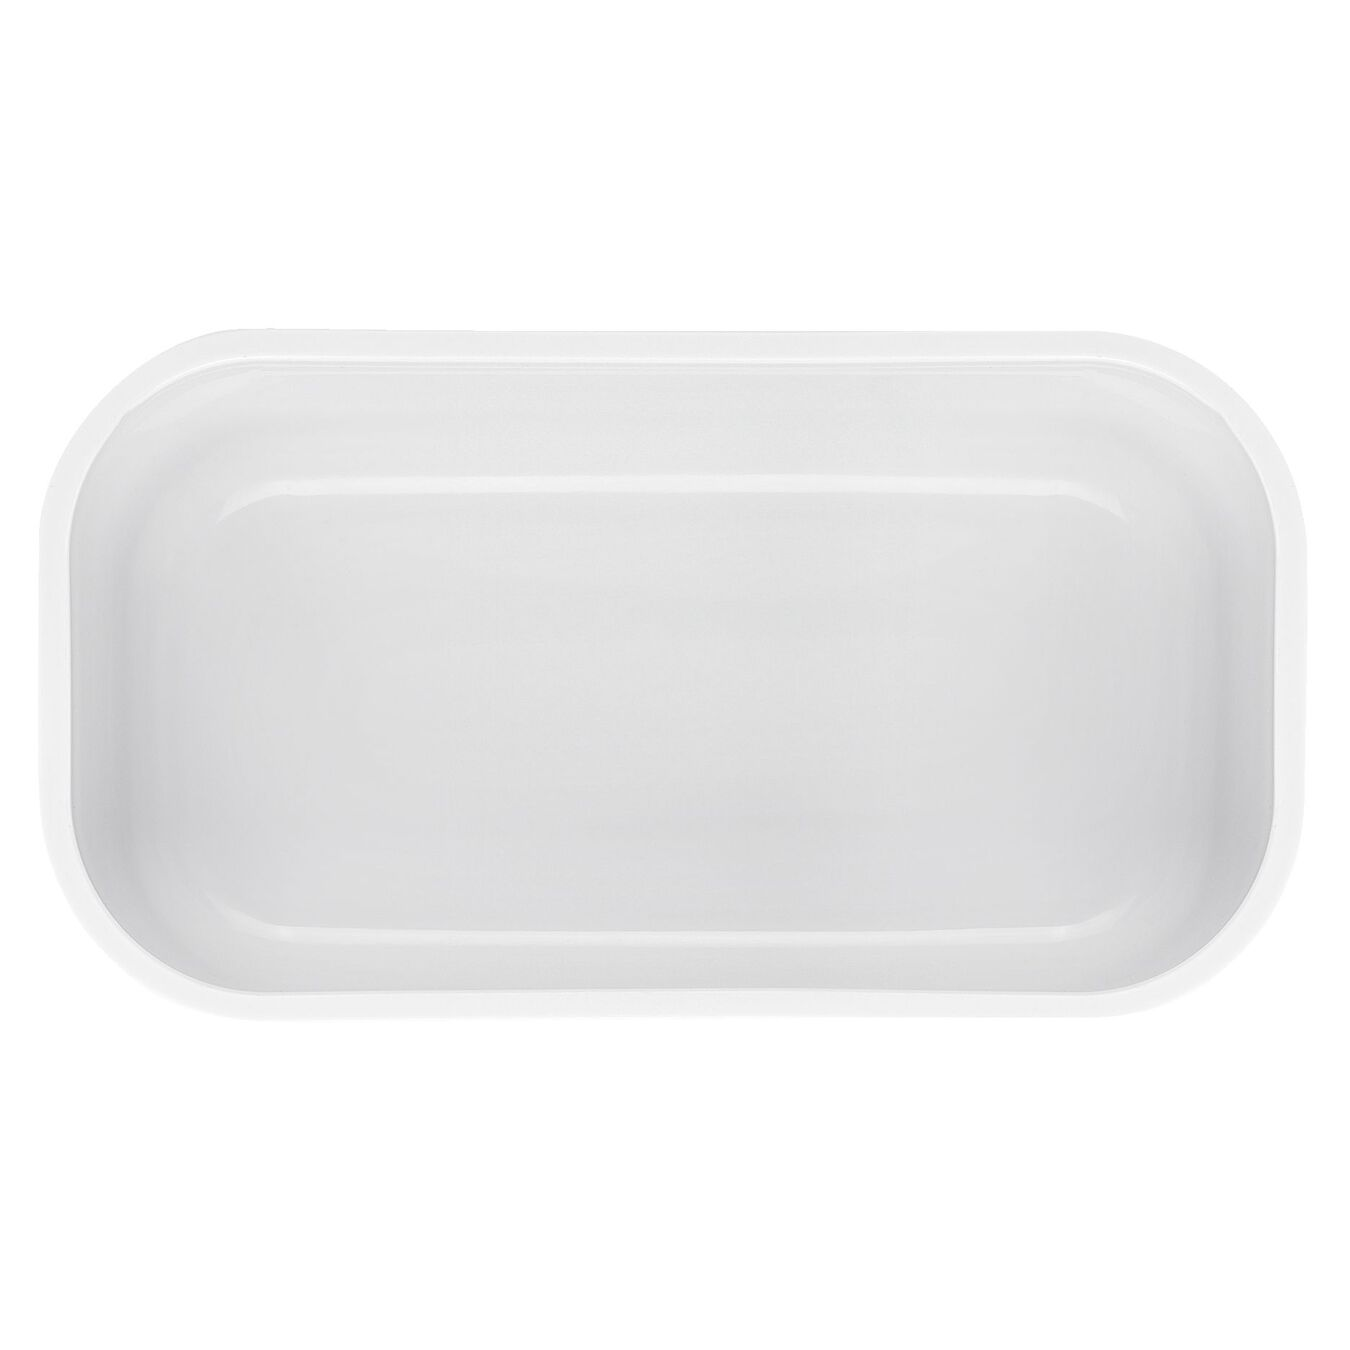 Vakuum Lunchbox, S, Kunststoff, Weiß-Rot,,large 4